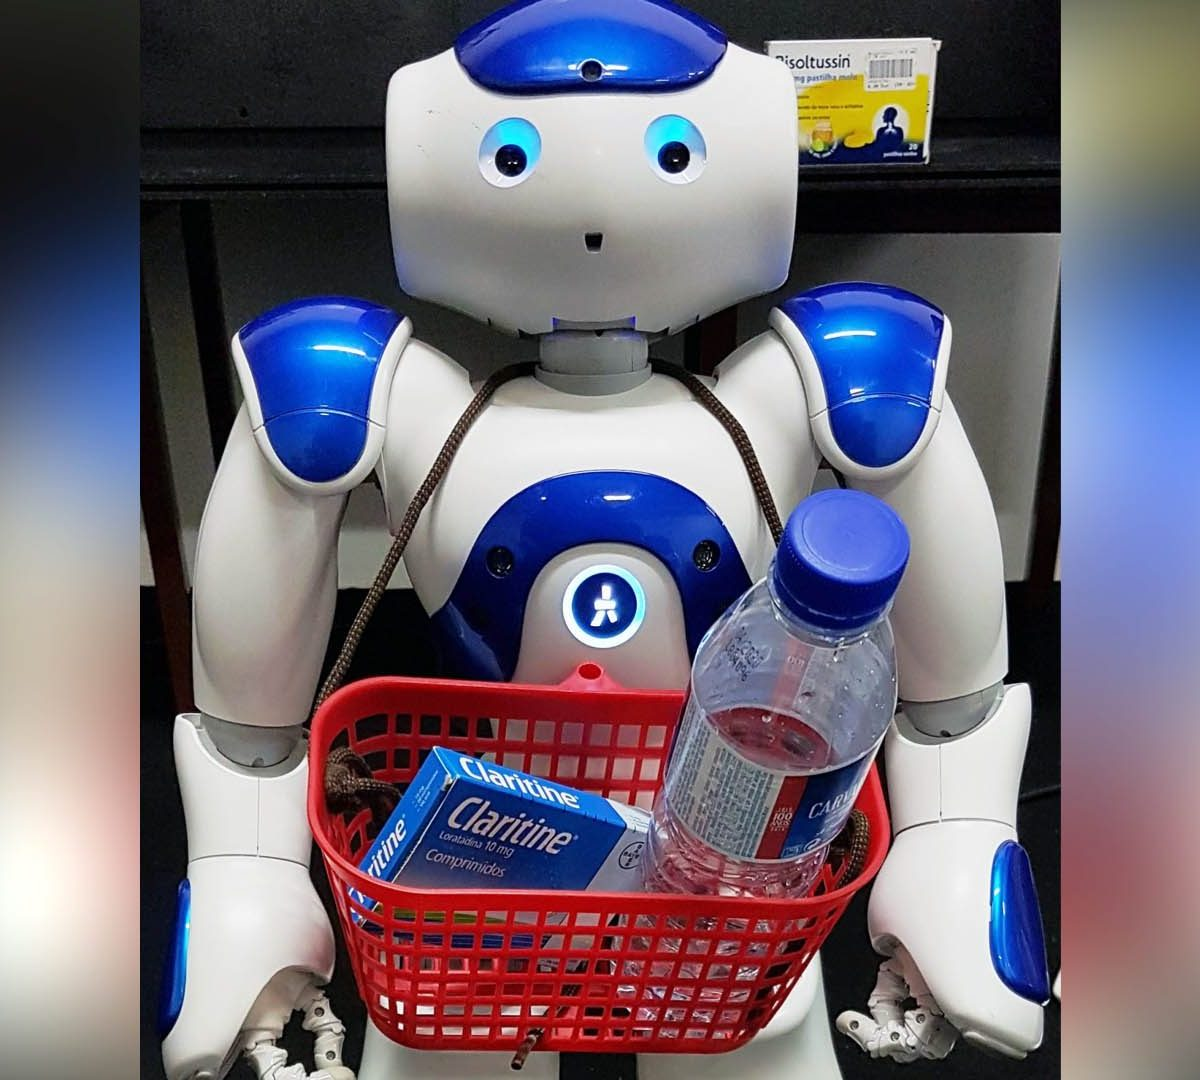 Robô ajuda Idosos - Imagem UTAD